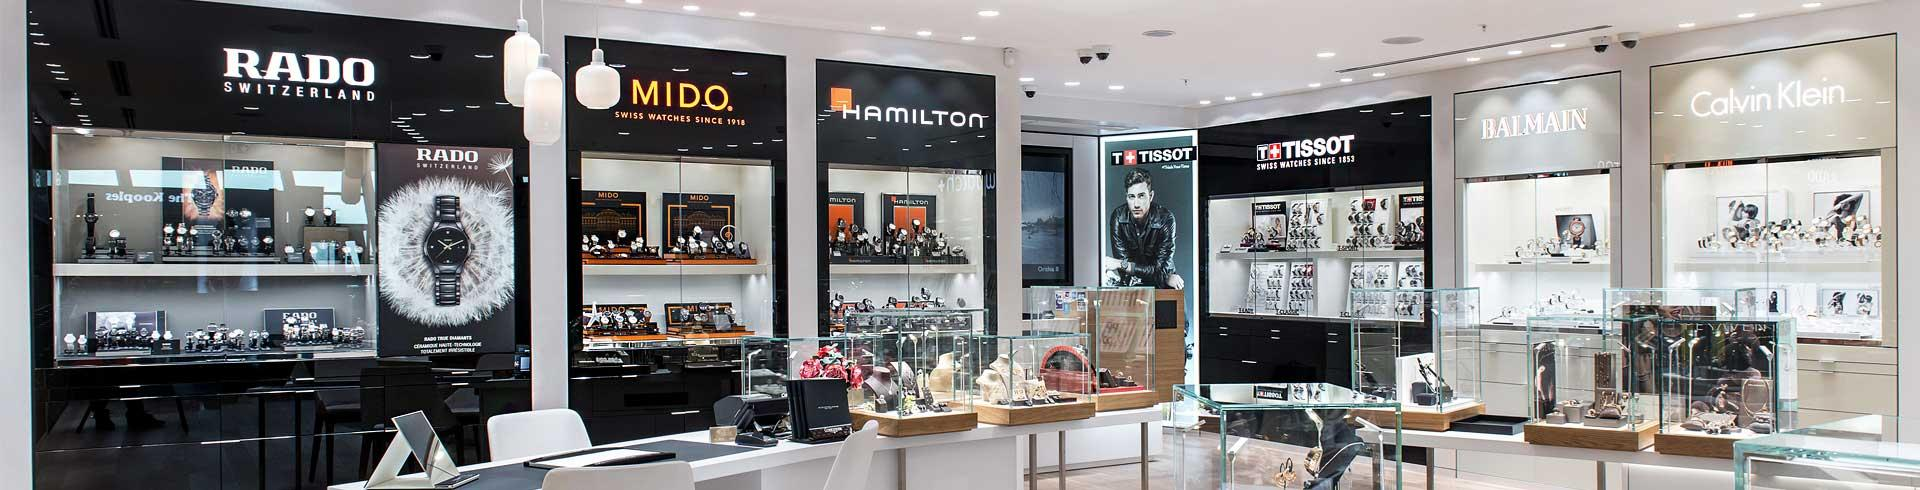 hour passion horlogerie joaillerie terminal 1 boutiques services la promenade nice. Black Bedroom Furniture Sets. Home Design Ideas